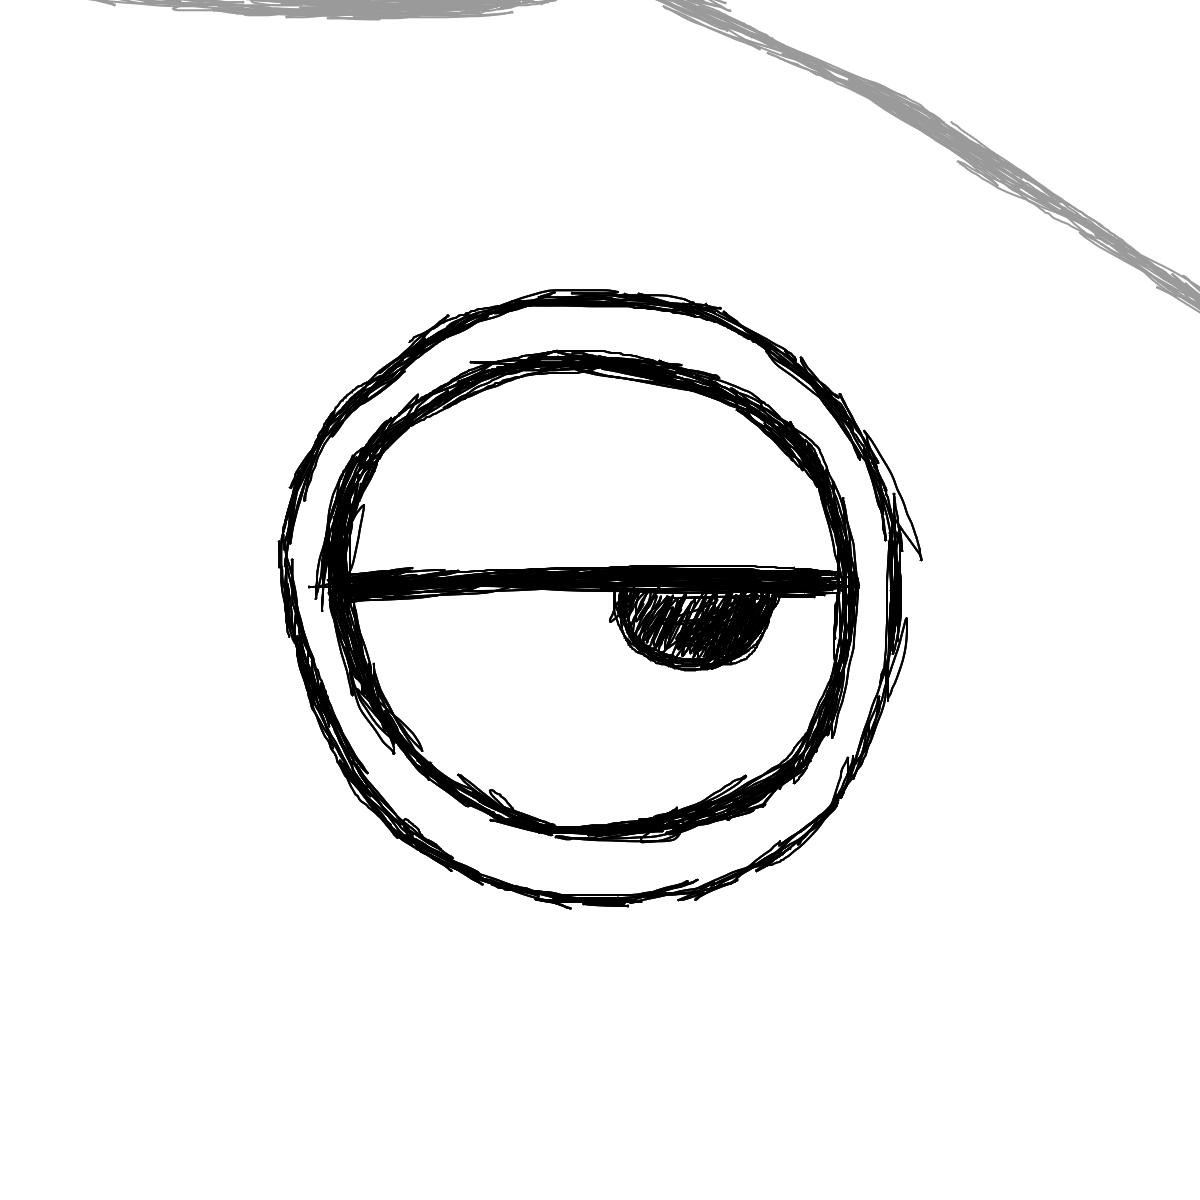 BAAAM drawing#791 lat:44.3511848449707000lng: -4.6807203292846680